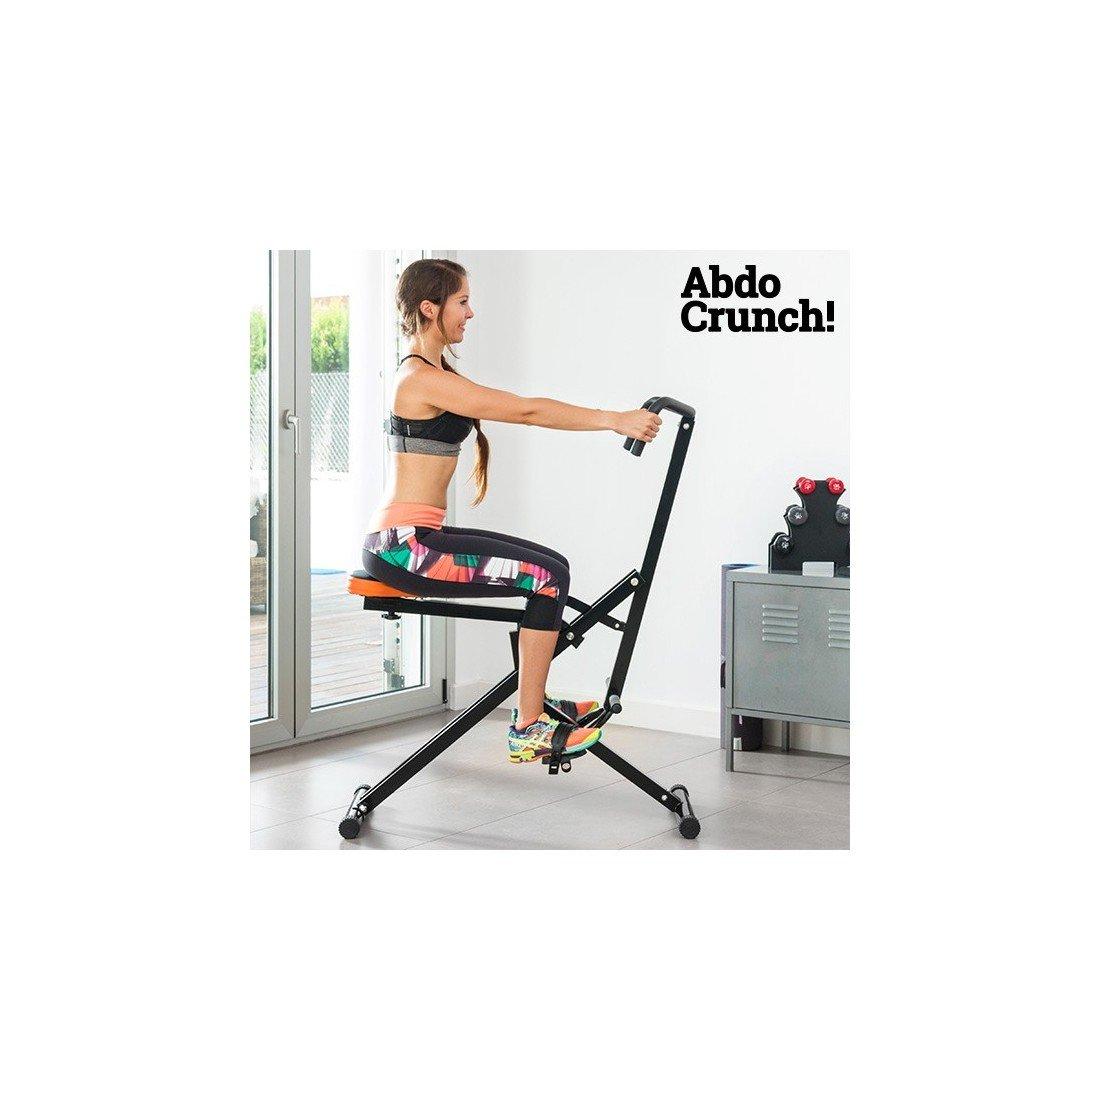 Apolyne Abdo Crunch - Ejercitador Total de Fitness, Negro / Rojo ...